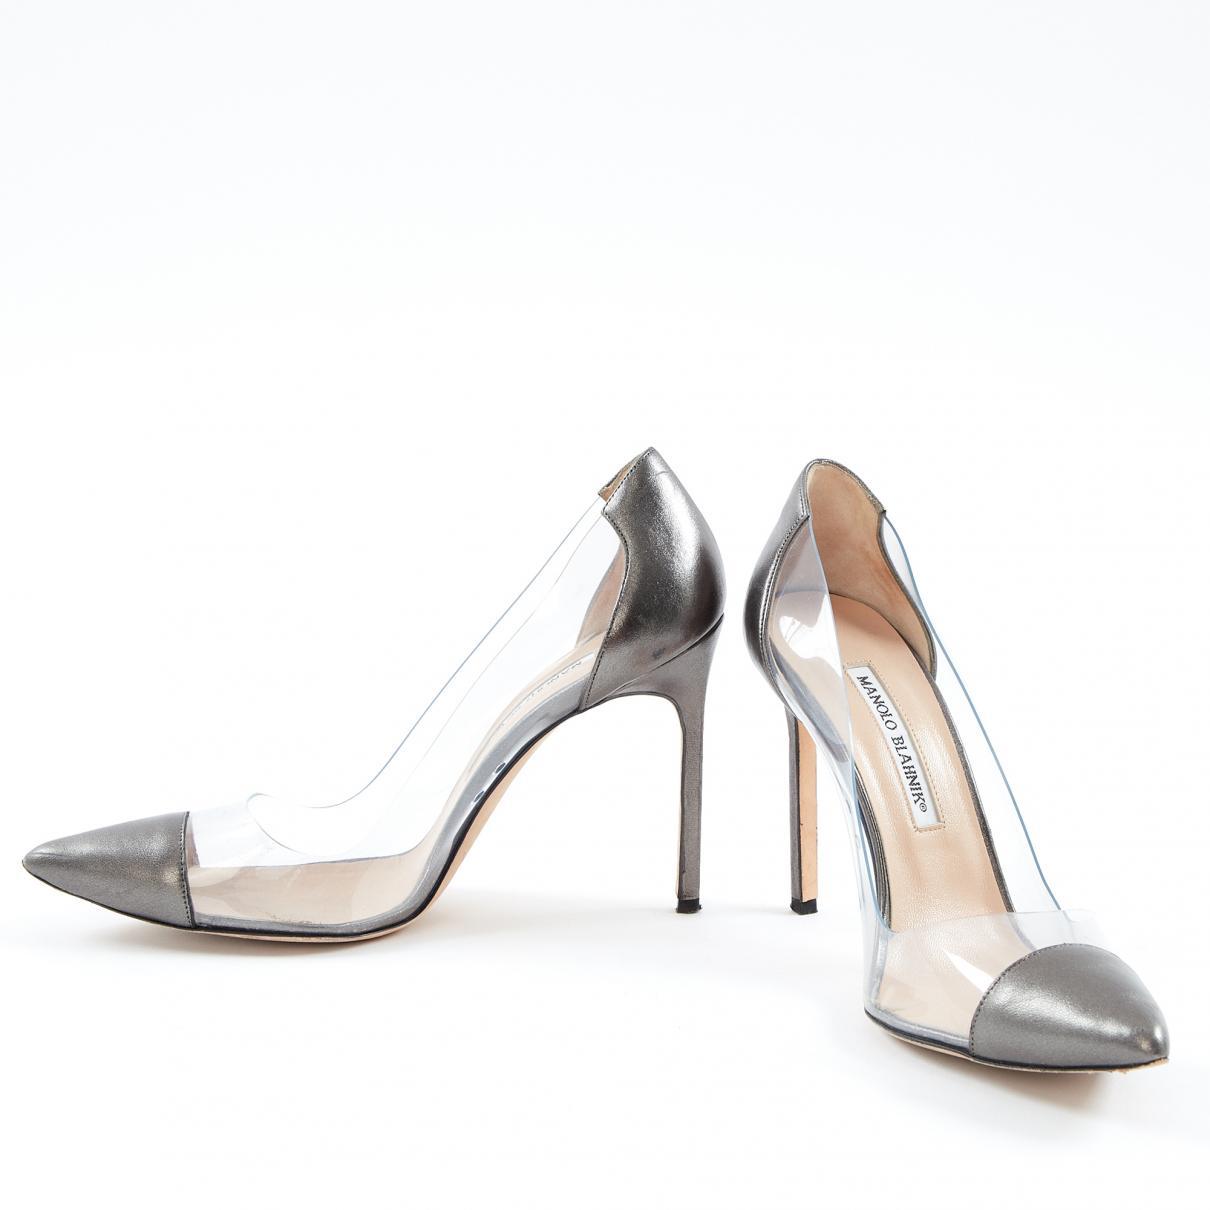 5e8b4050cad Manolo Blahnik - Metallic Pre-owned Silver Leather Heels - Lyst. View  fullscreen